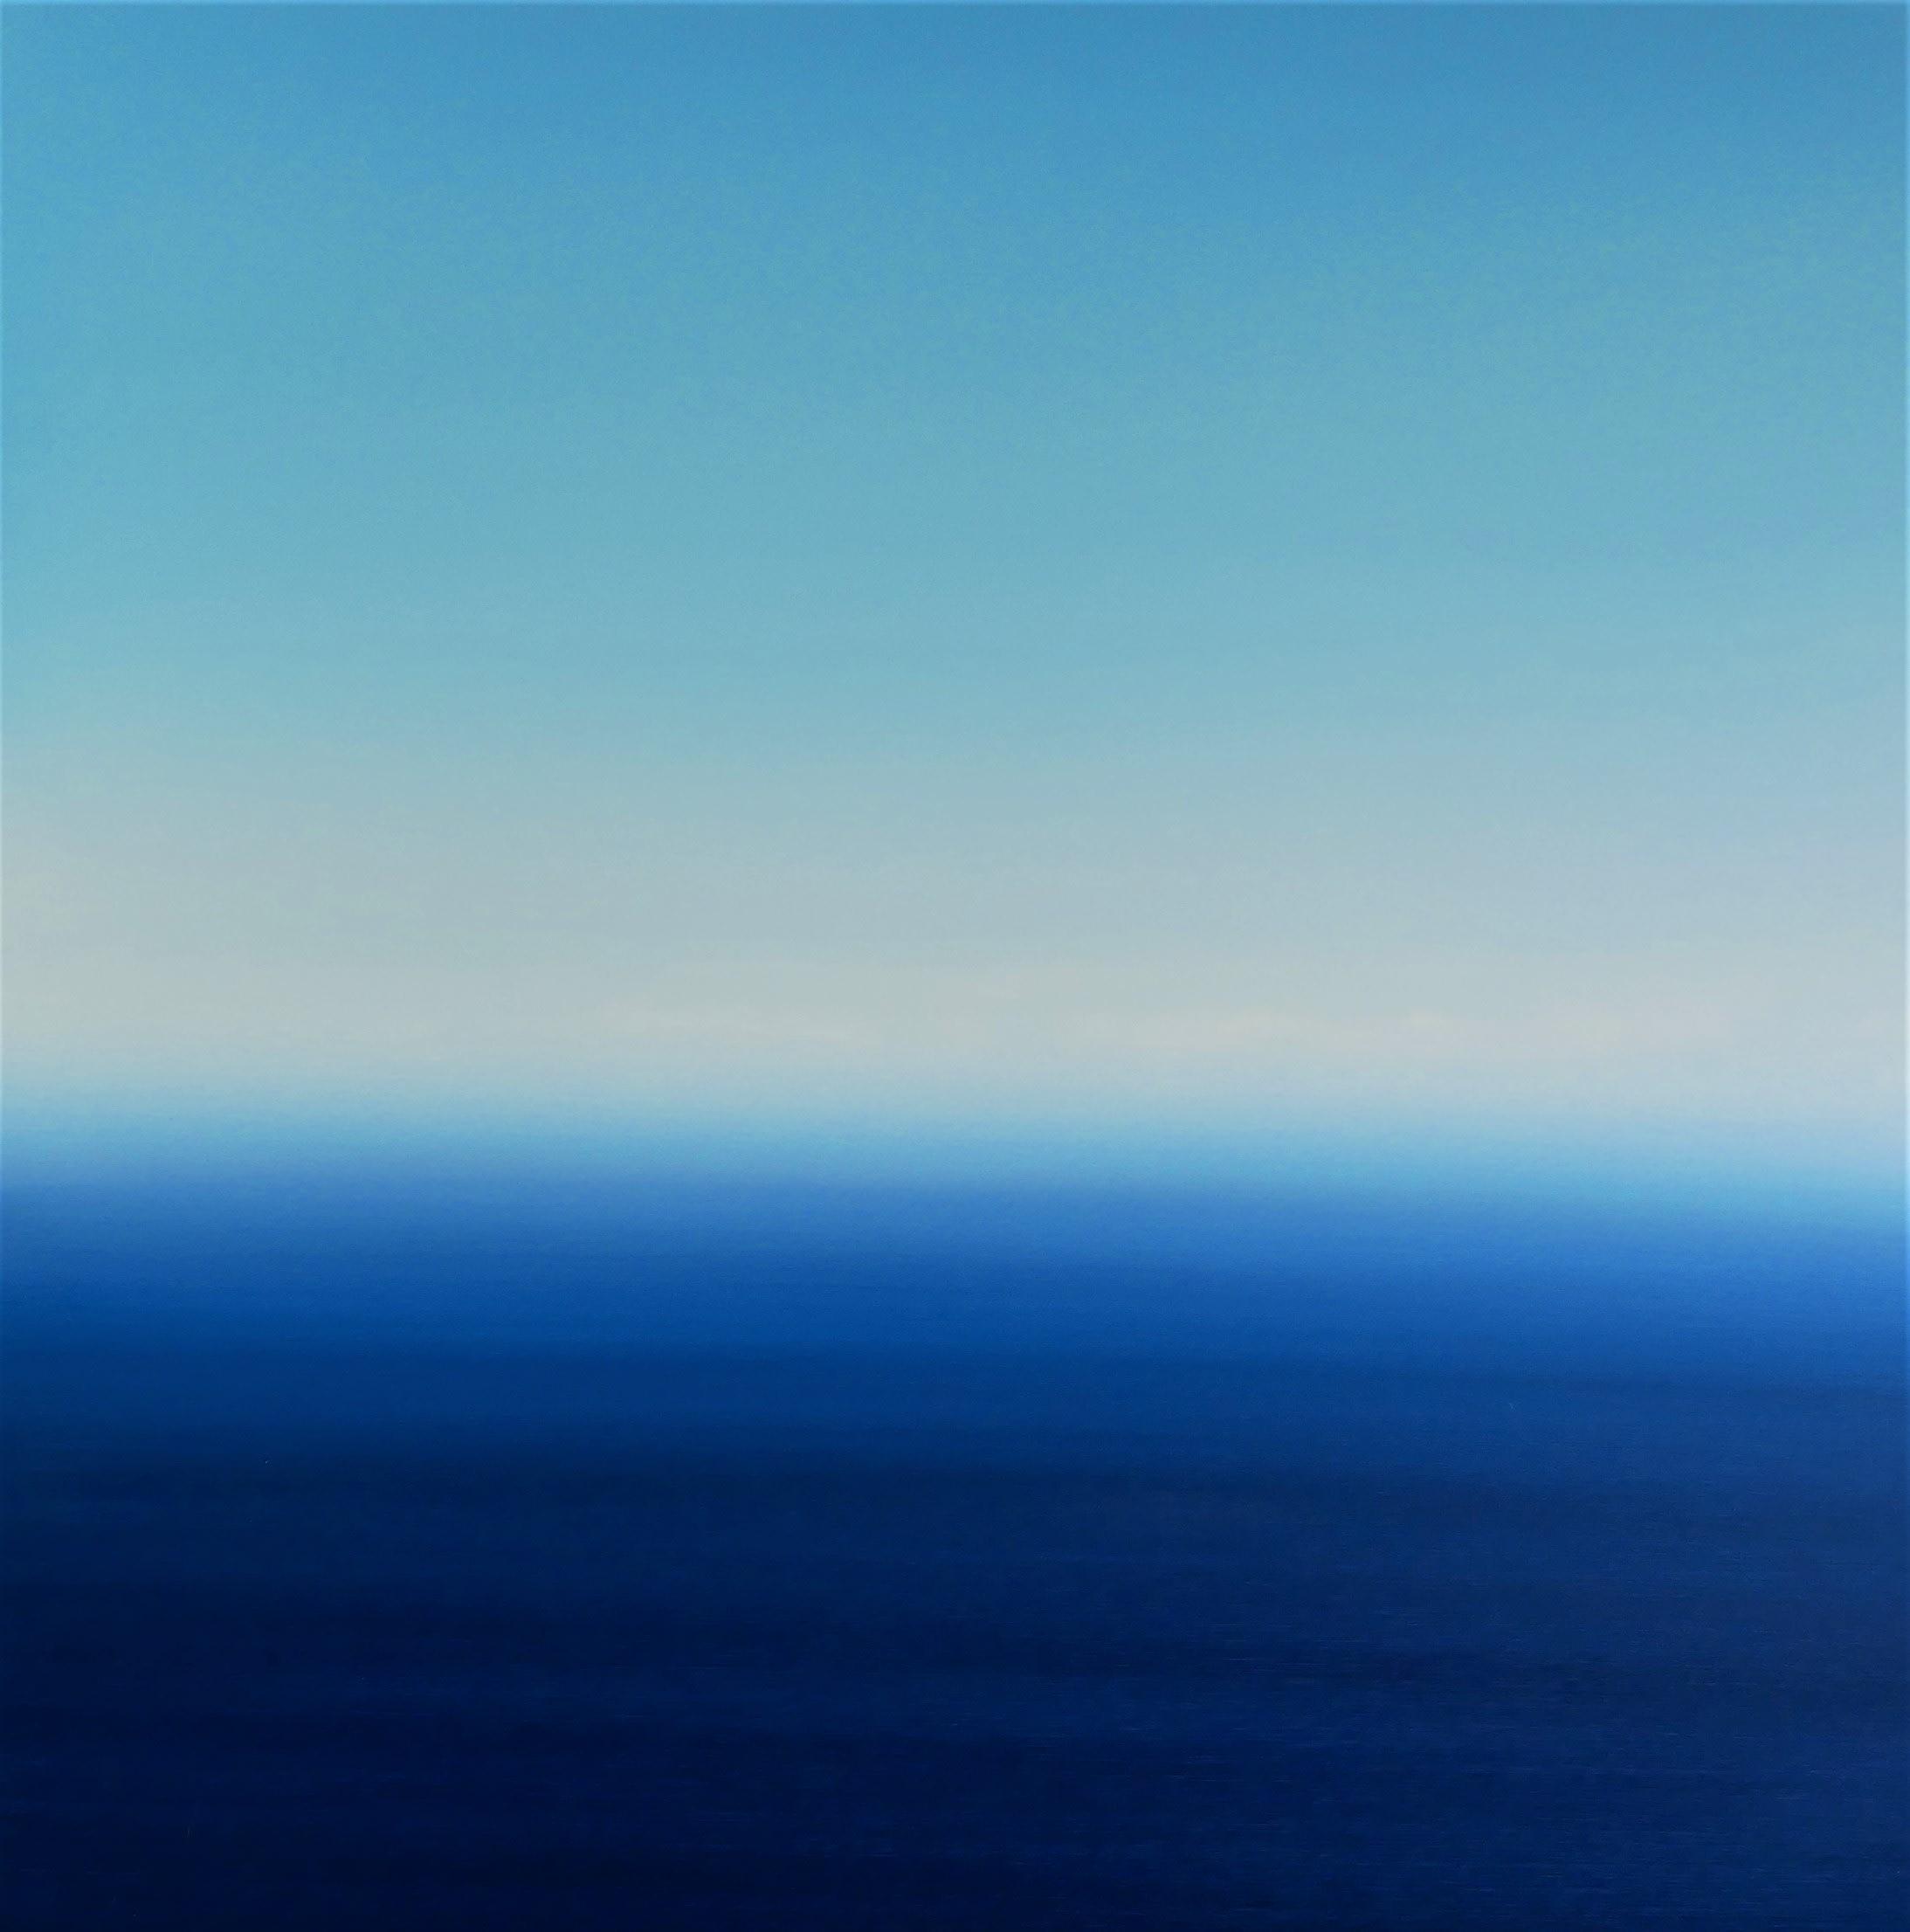 "<span class=""link fancybox-details-link""><a href=""/artists/78-martyn-perryman/works/7397-martyn-perryman-atlantic-light-st-ives-bay-2021/"">View Detail Page</a></span><div class=""artist""><strong>Martyn Perryman</strong></div> b. 1963 <div class=""title""><em>Atlantic Light St Ives Bay </em>, 2021</div> <div class=""medium"">oil on canvas</div> <div class=""dimensions"">h. 100 x w. 100 cm </div><div class=""copyright_line"">Ownart: £140 x 10 Months, 0% APR</div>"